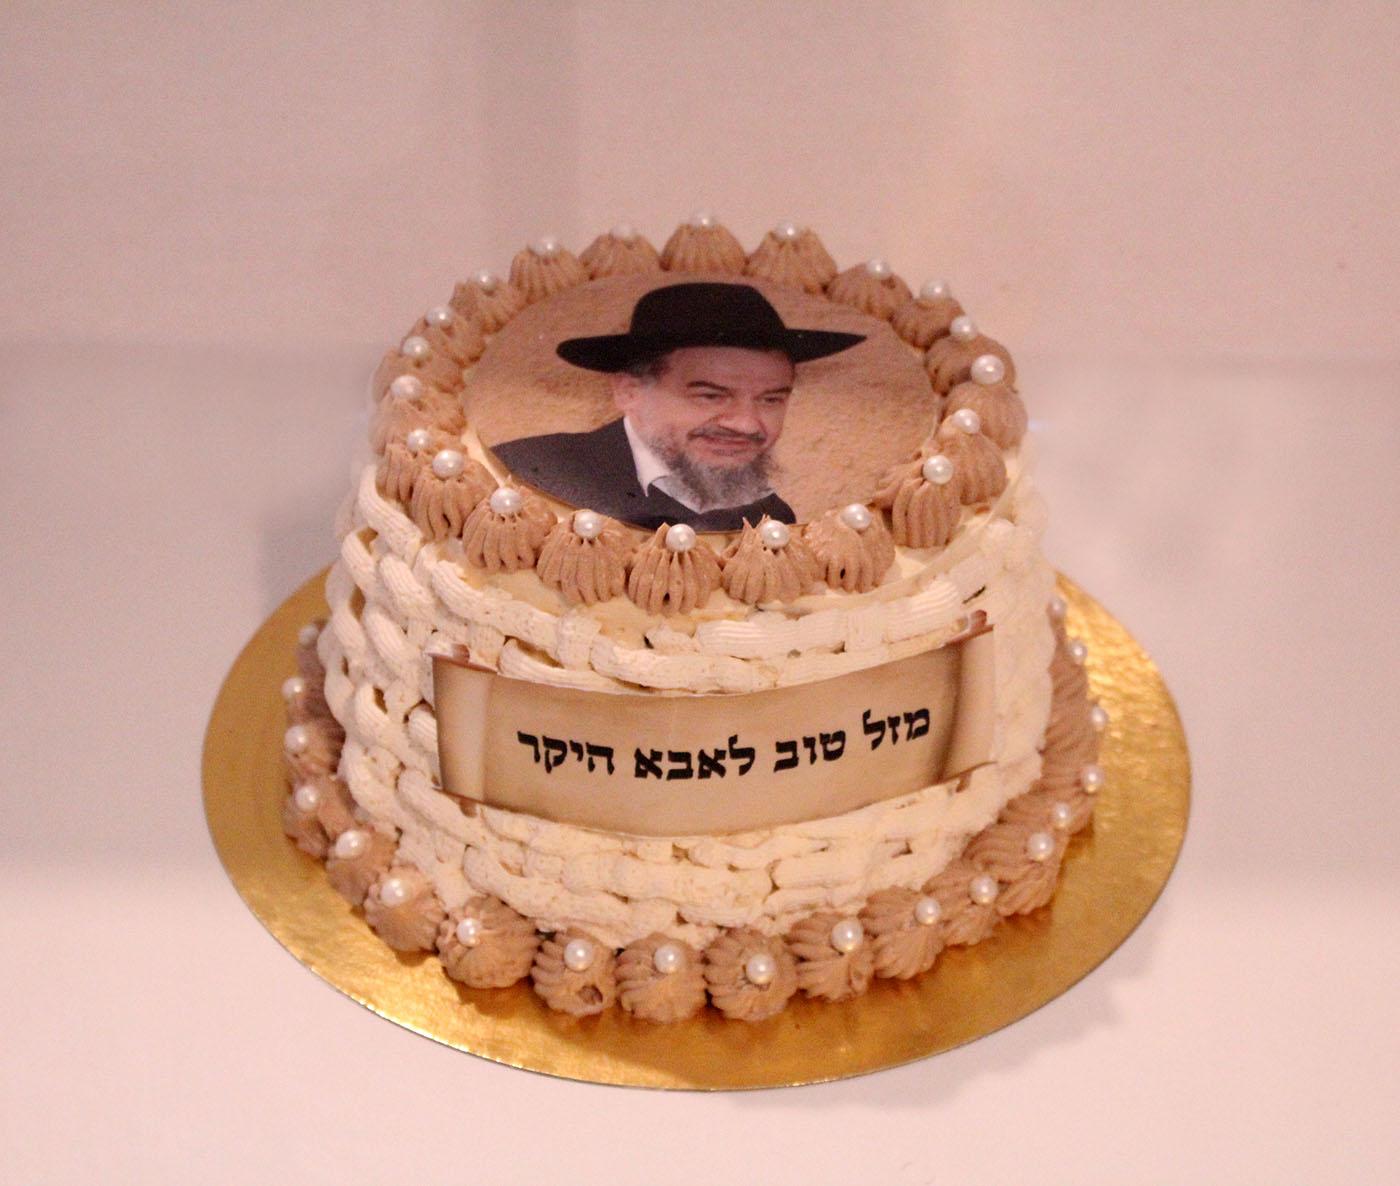 IMG 9541 - עוגת זילוף